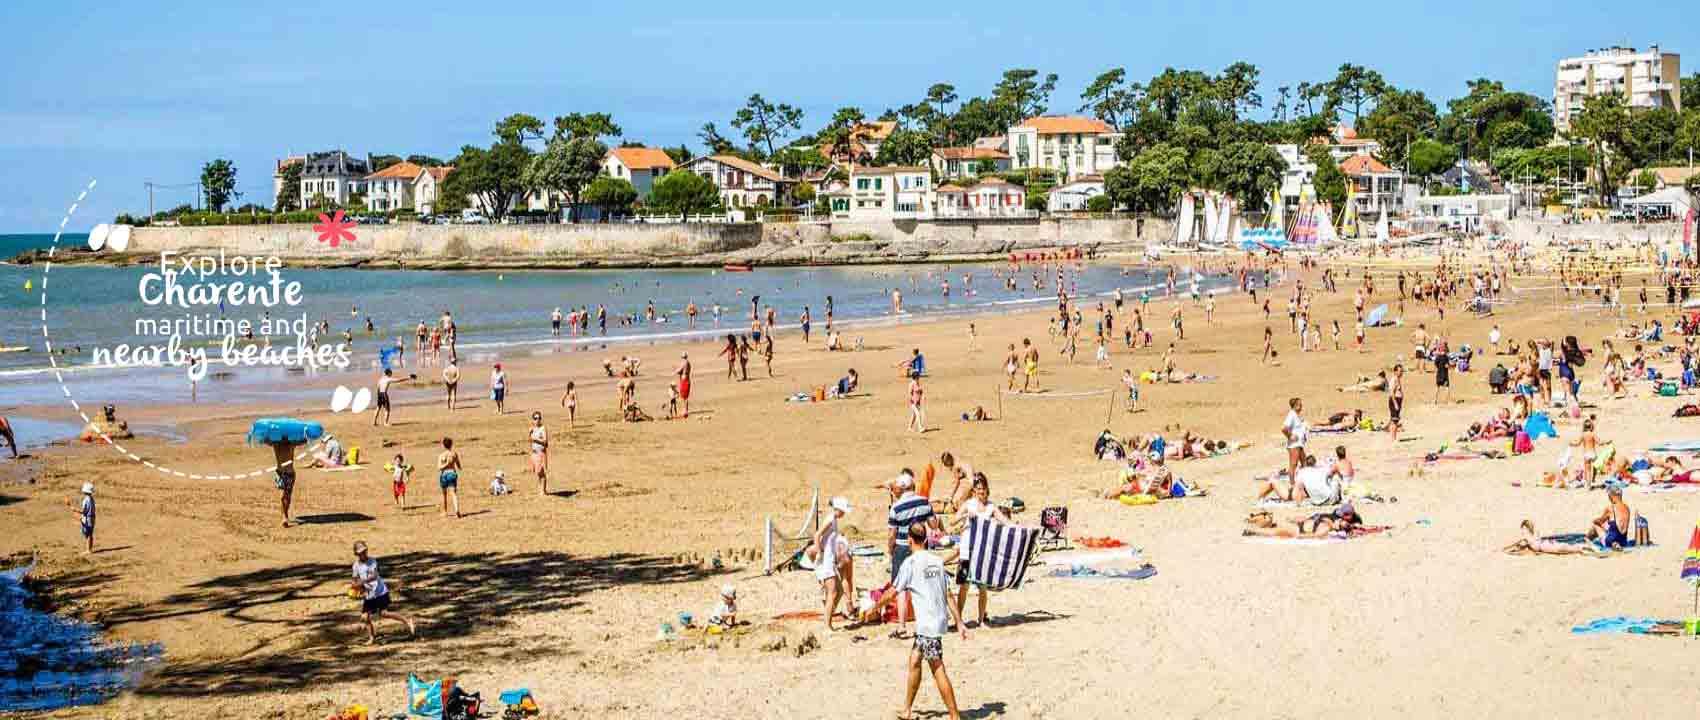 Camping beach Charente Maritime